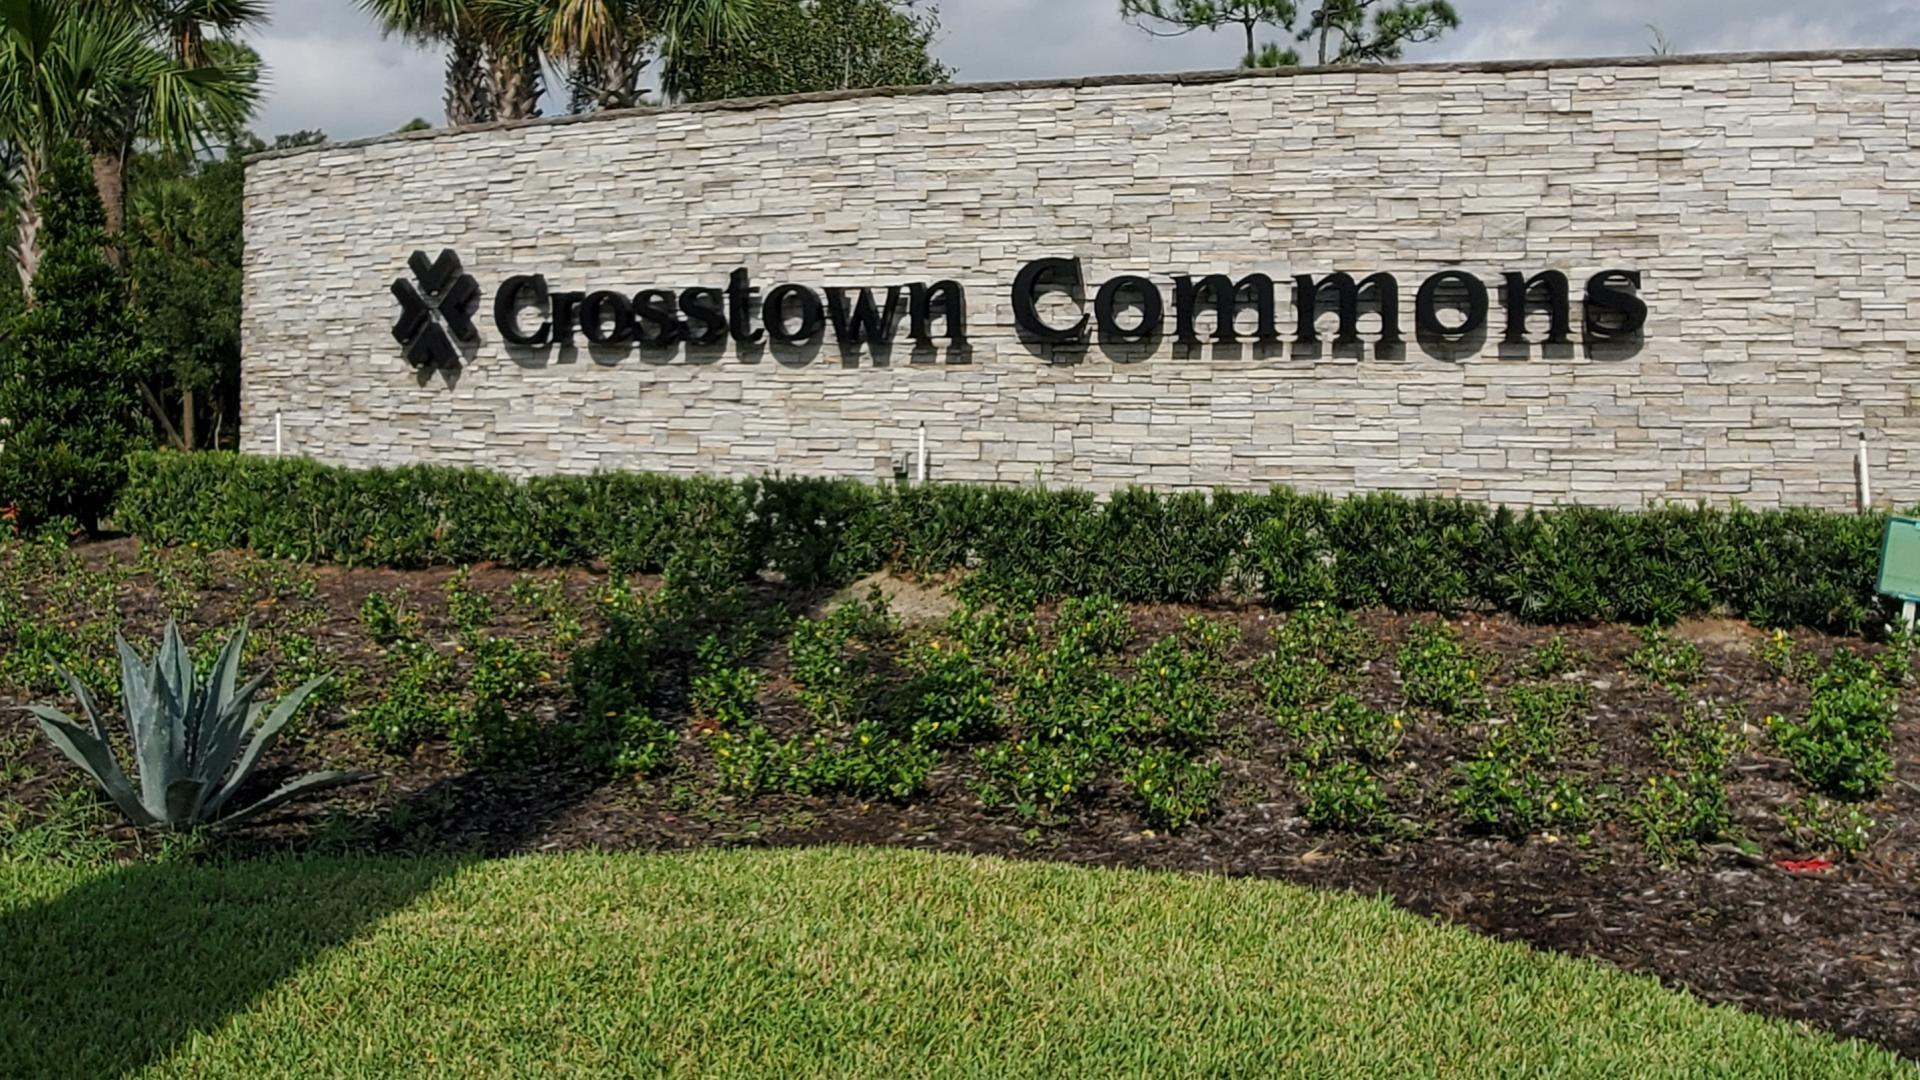 Crosstown Commons,34986